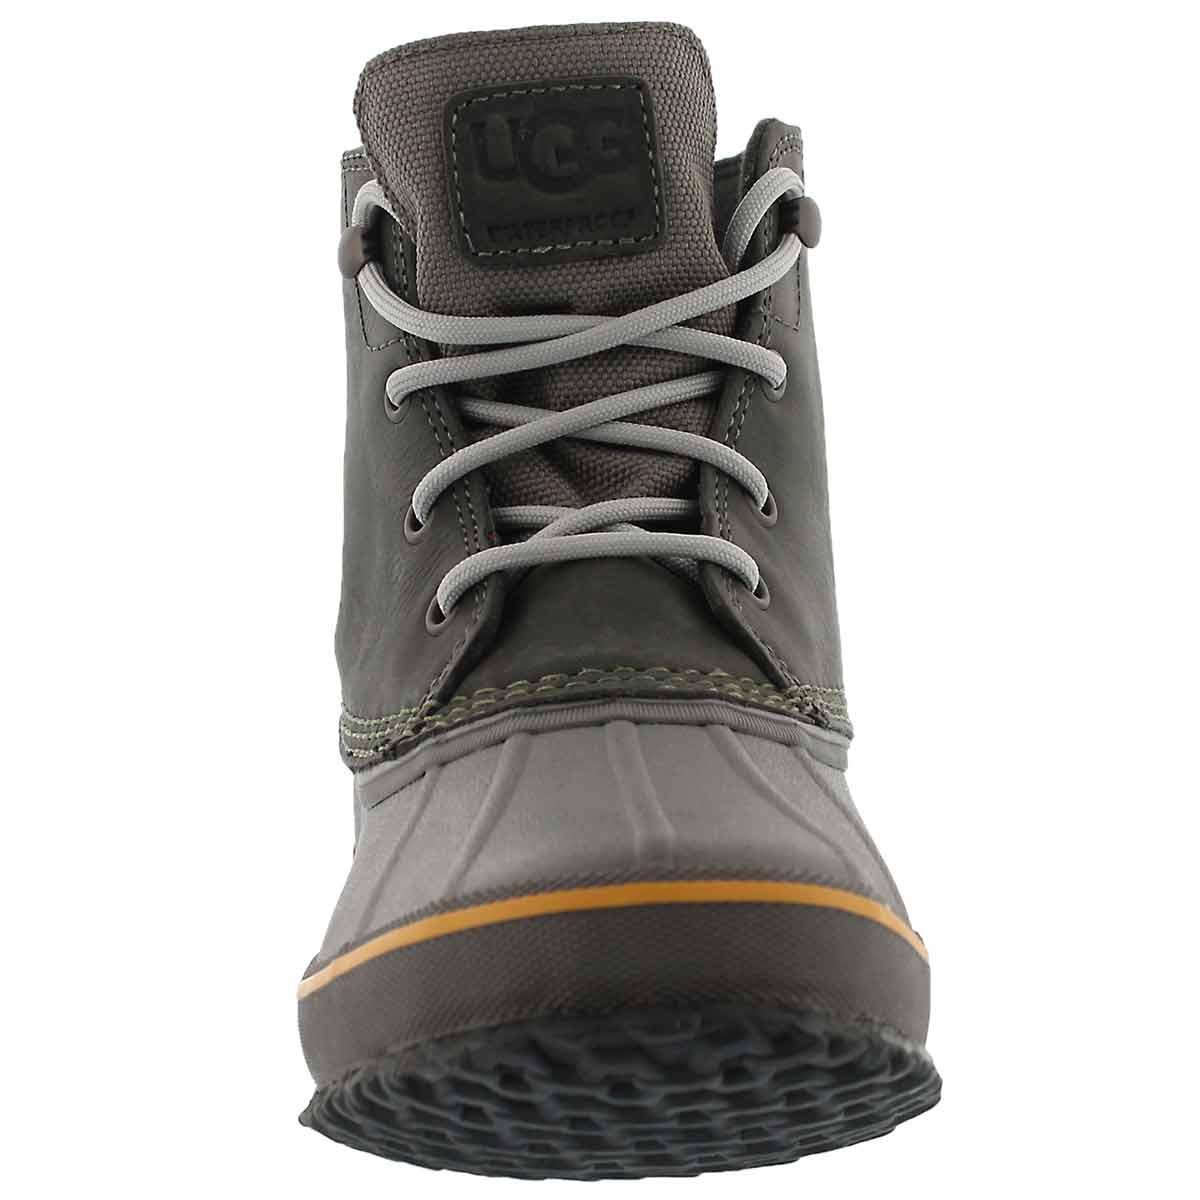 Mns Zetik metal lace up wtpf ankle boot